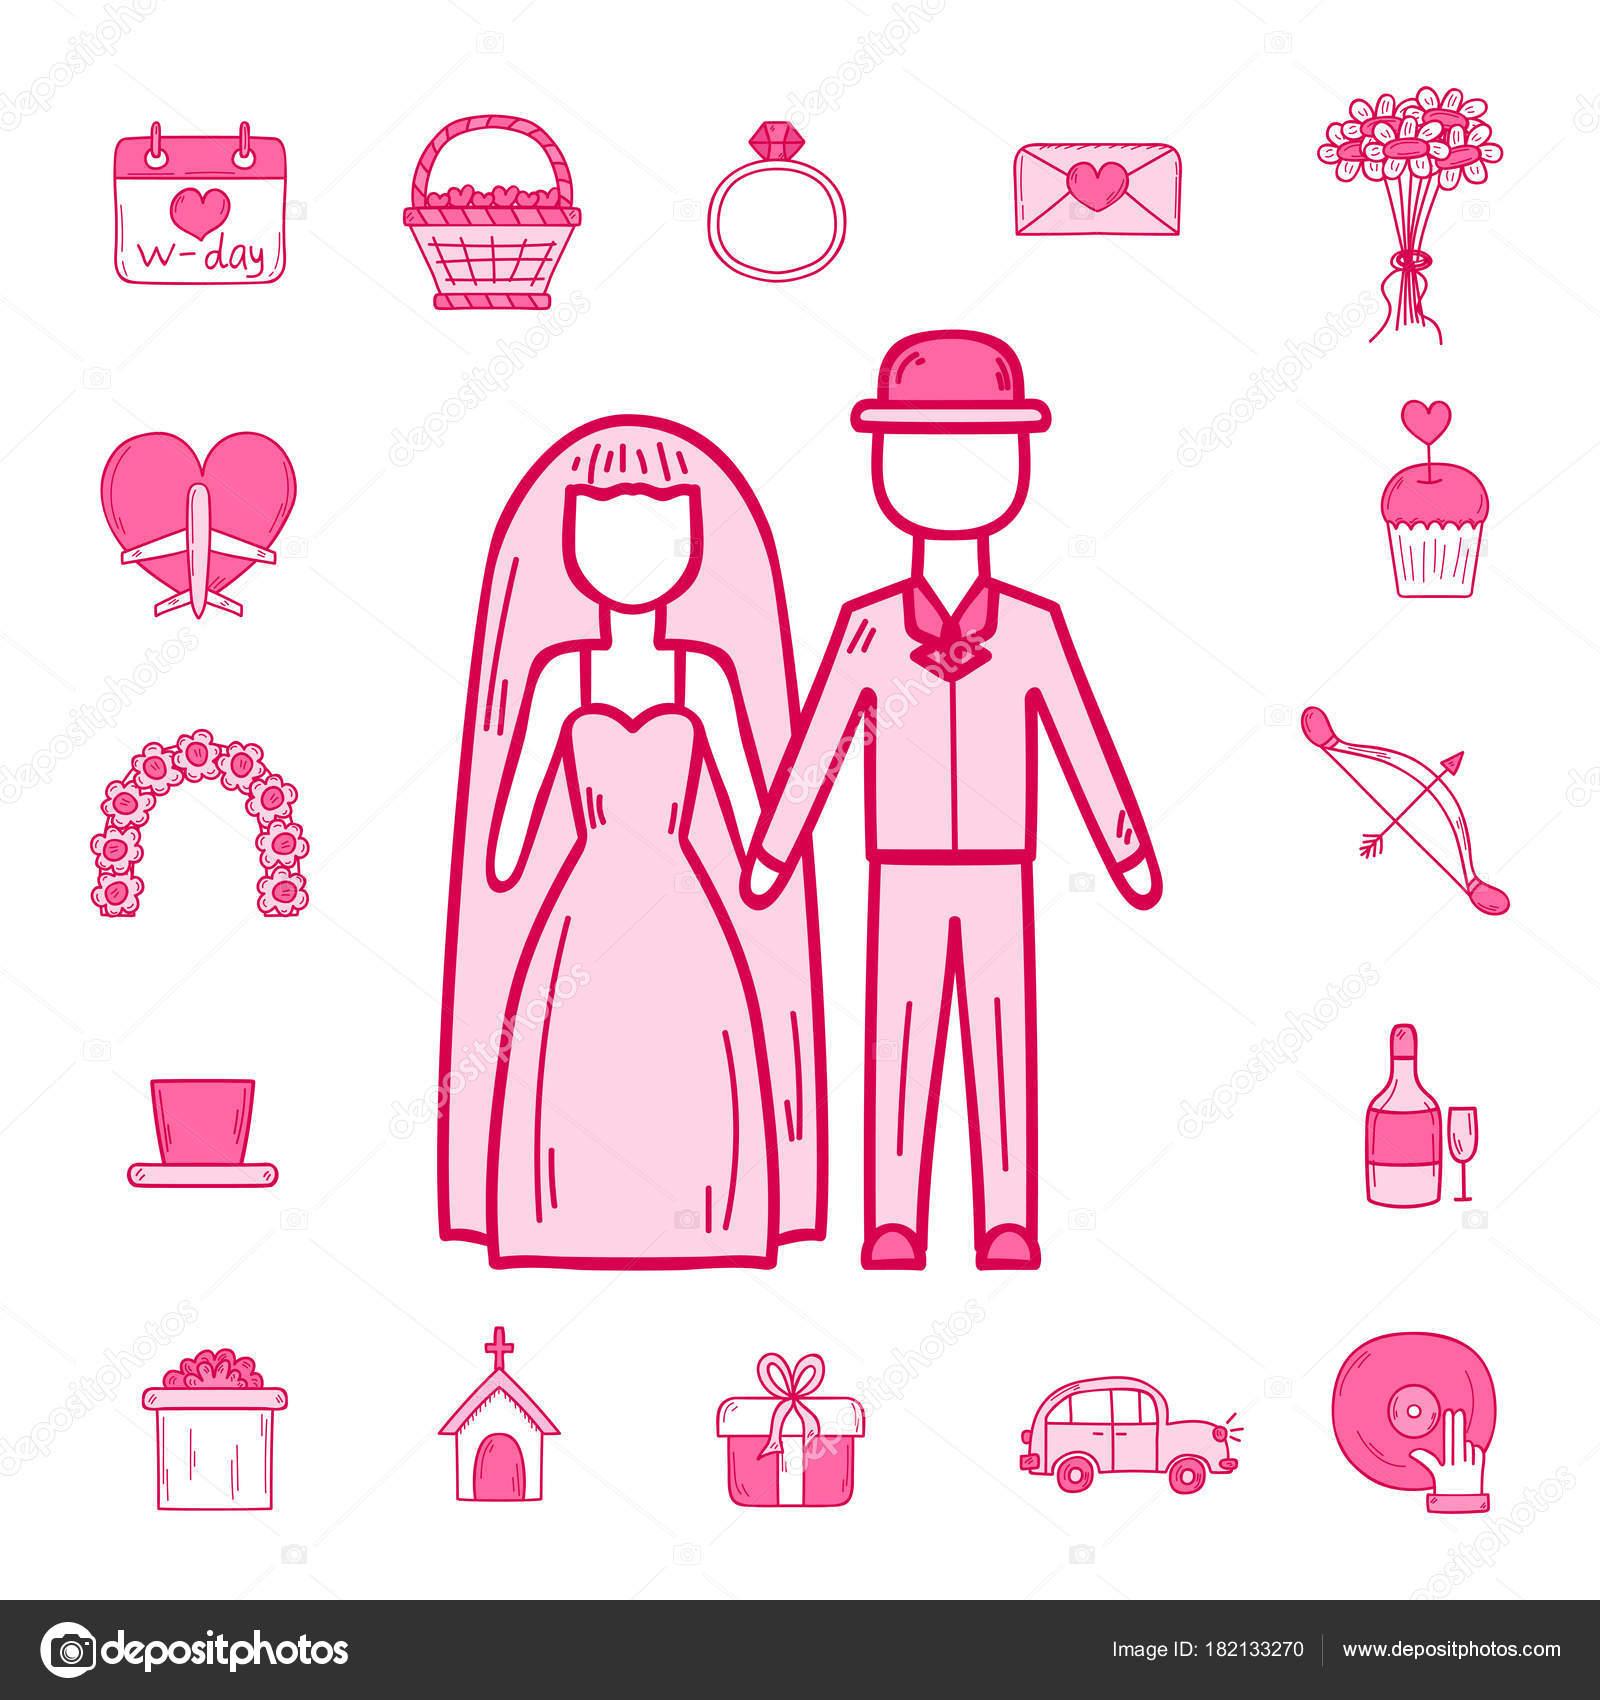 Contorno de boda matrimonio compromiso novio novia iconos vector ...